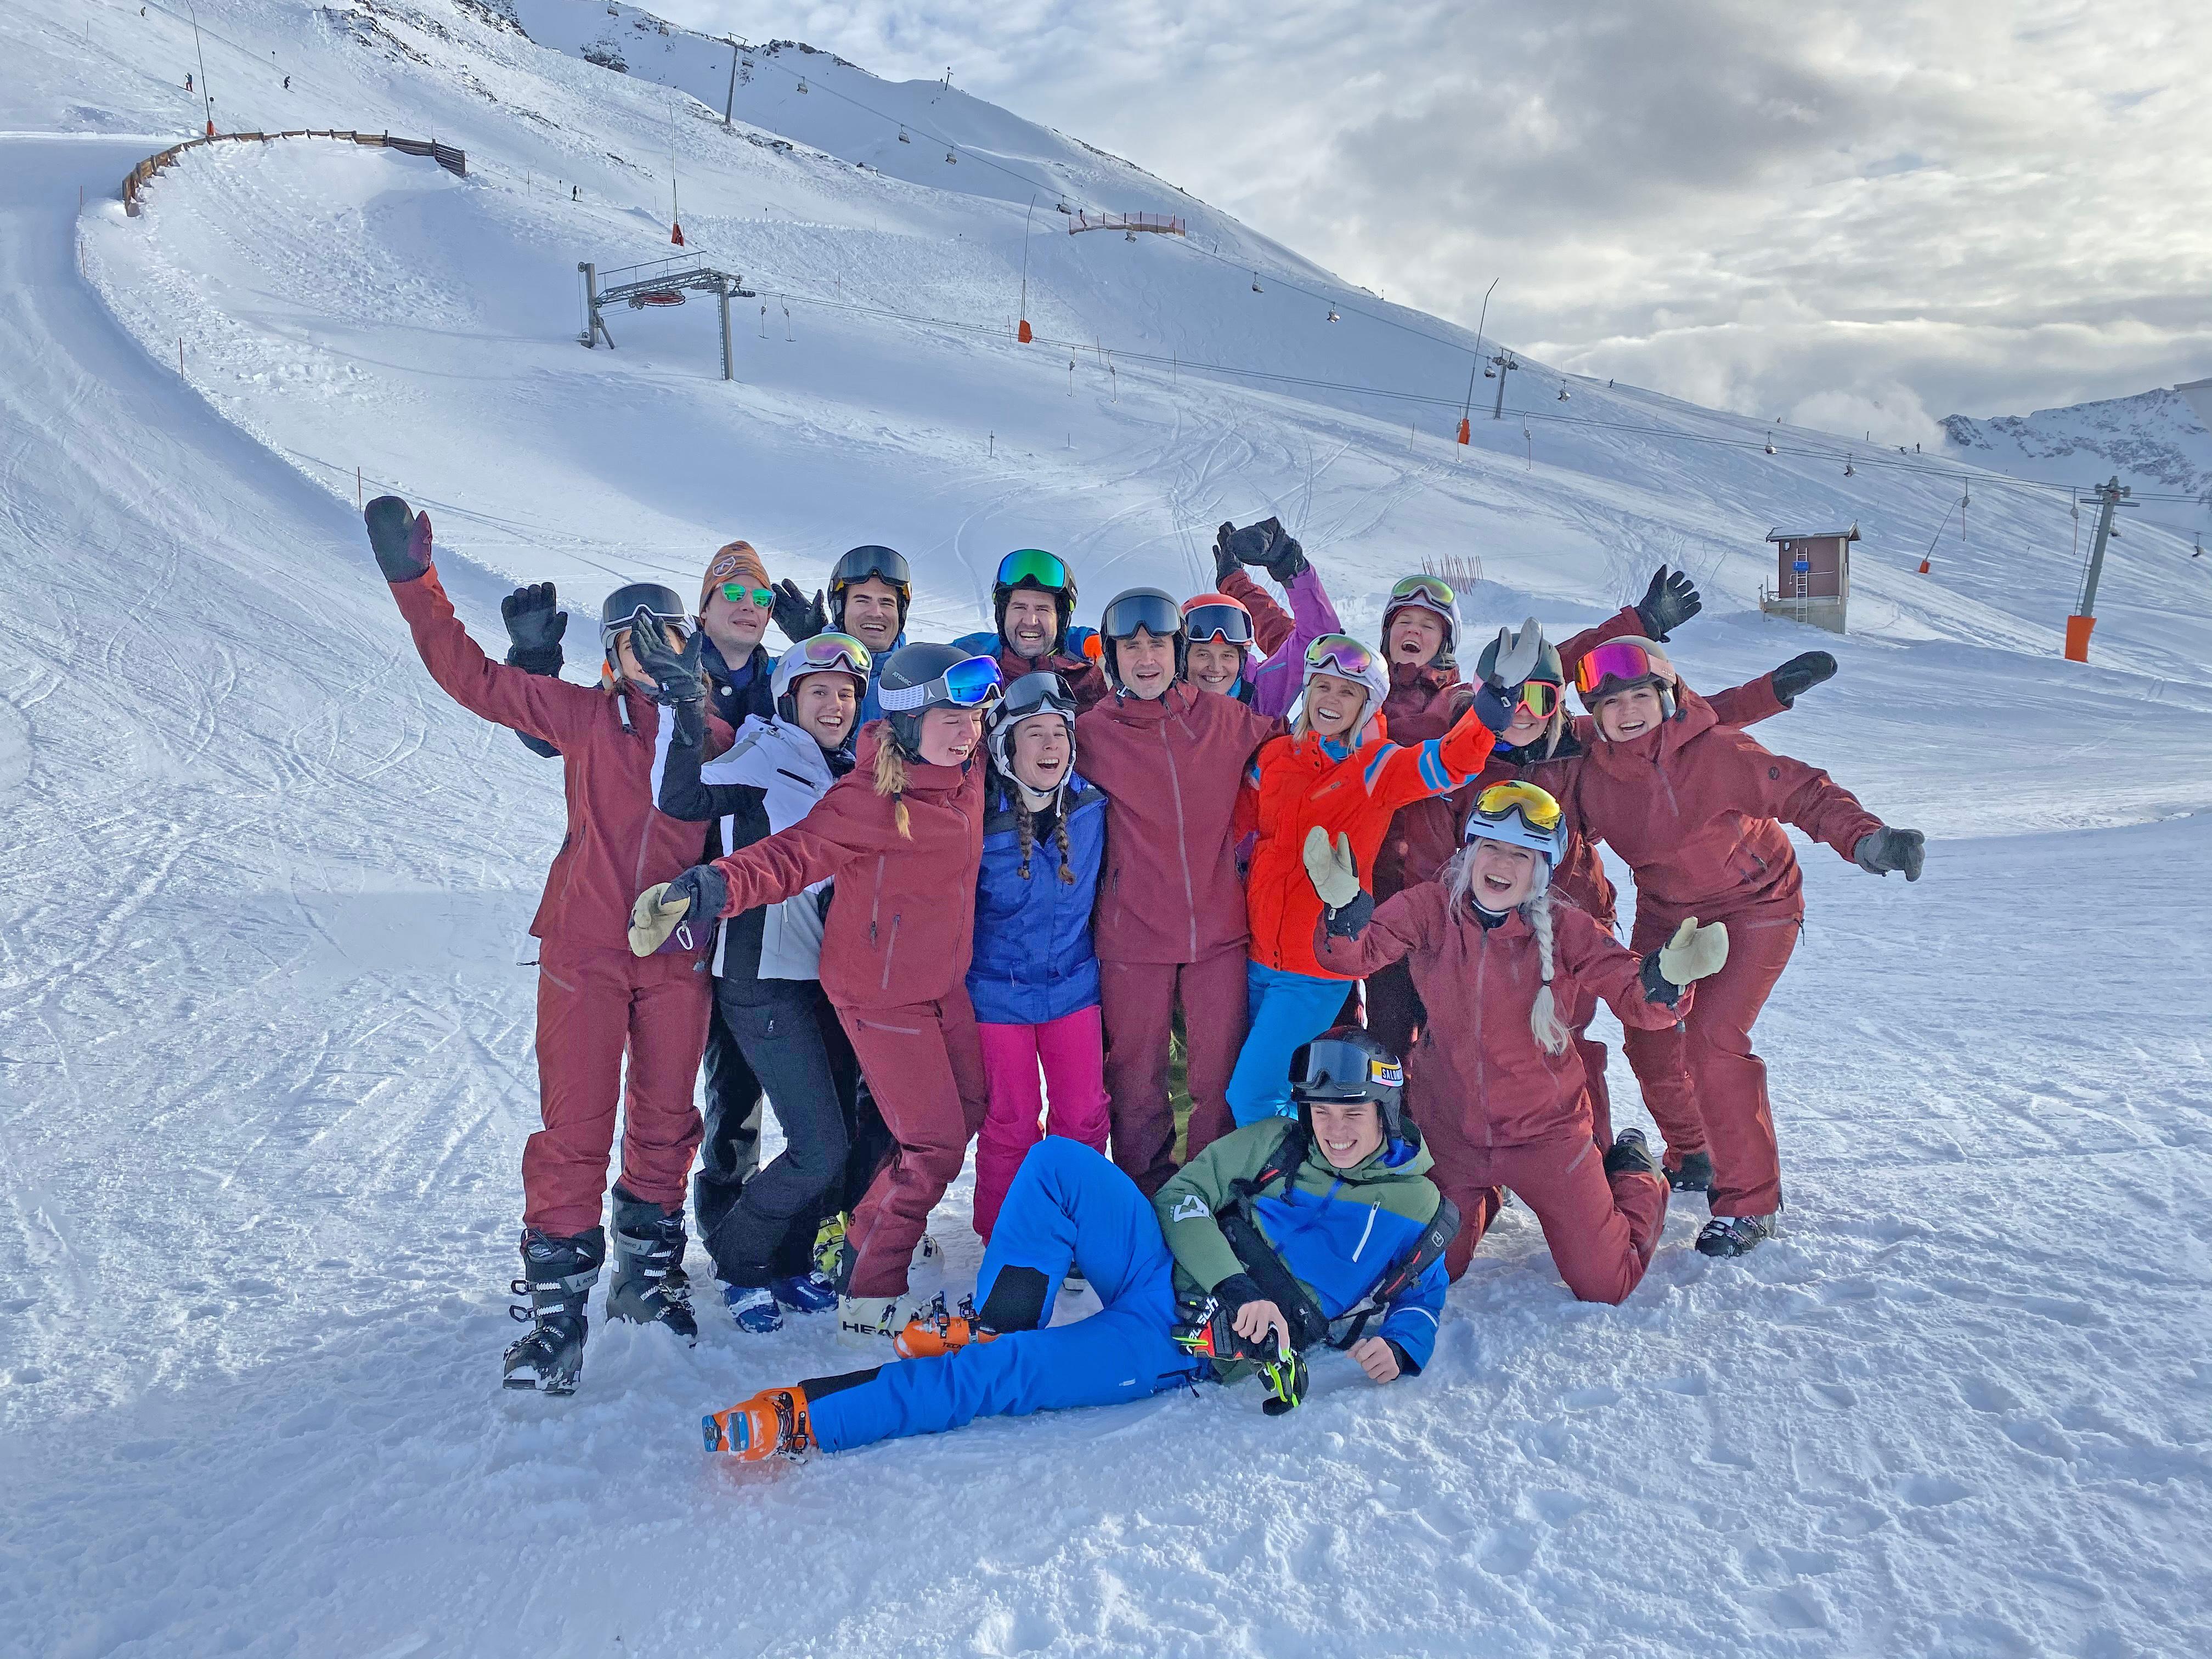 team ski opening gurgl snowplaza